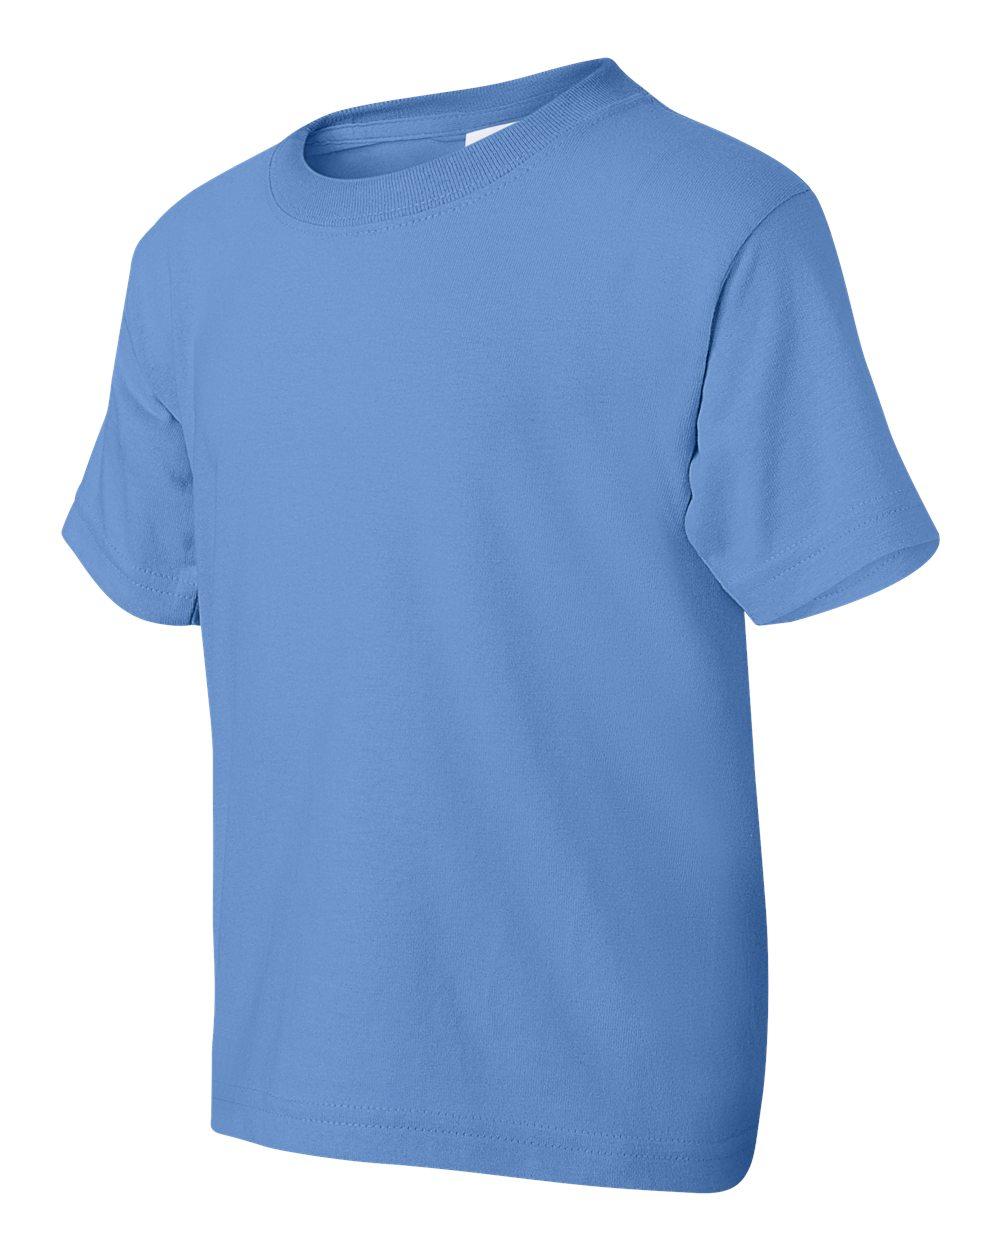 Gildan 8000b dryblend youth 50 50 t shirt friendly for Gildan t shirt printing